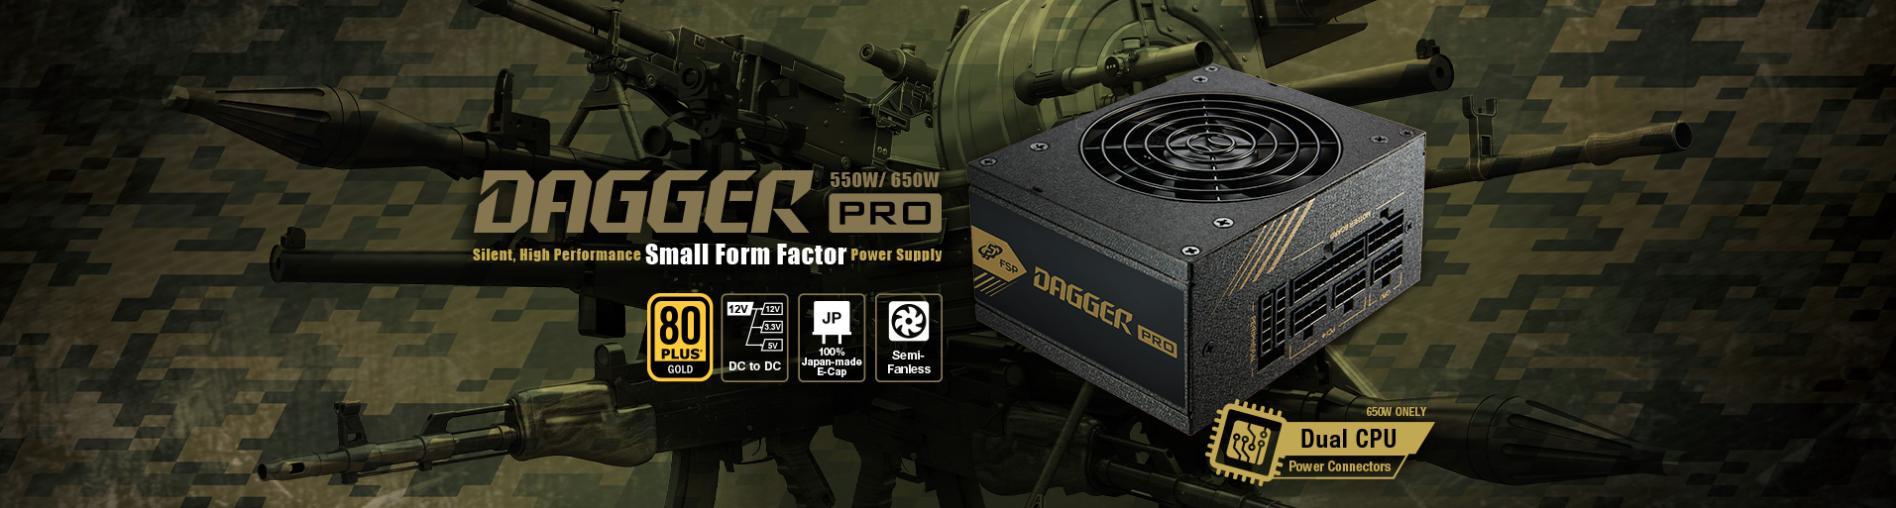 FSP Power Supply DAGGER PRO Series Model SDA2-650 - Active PFC (80 Plus Gold/Full Modular/Màu Đen/SFX) giới thiệu1